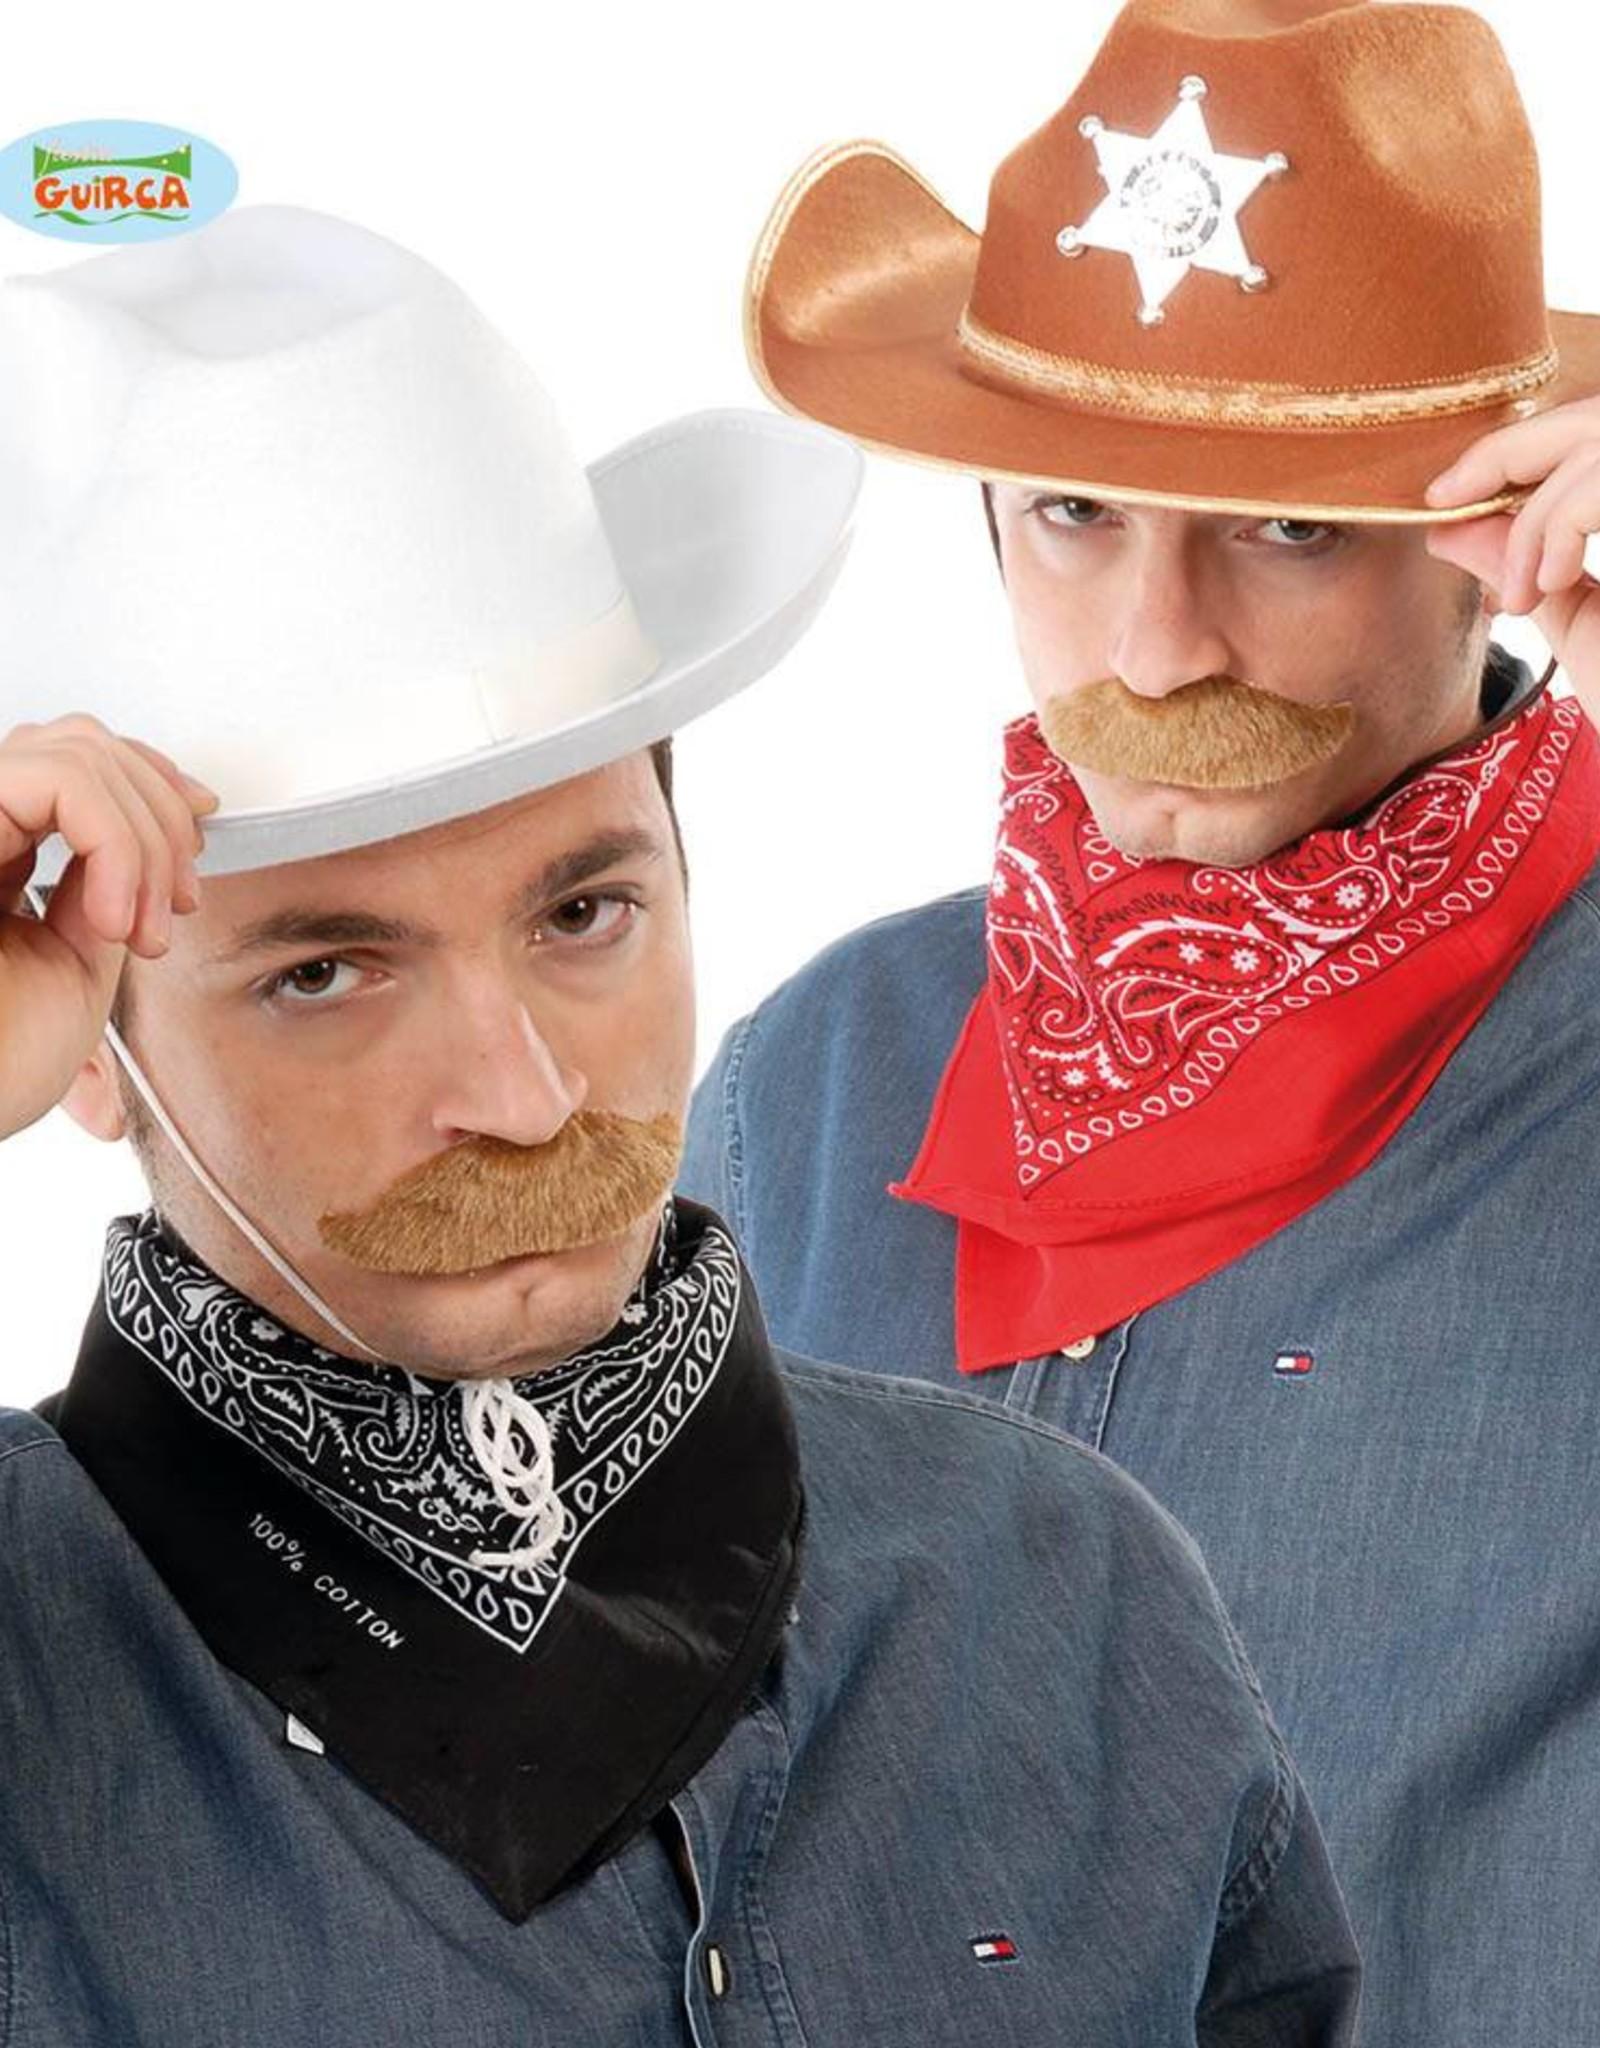 FIESTAS GUIRCA Zakdoek cowboy zwart en rood